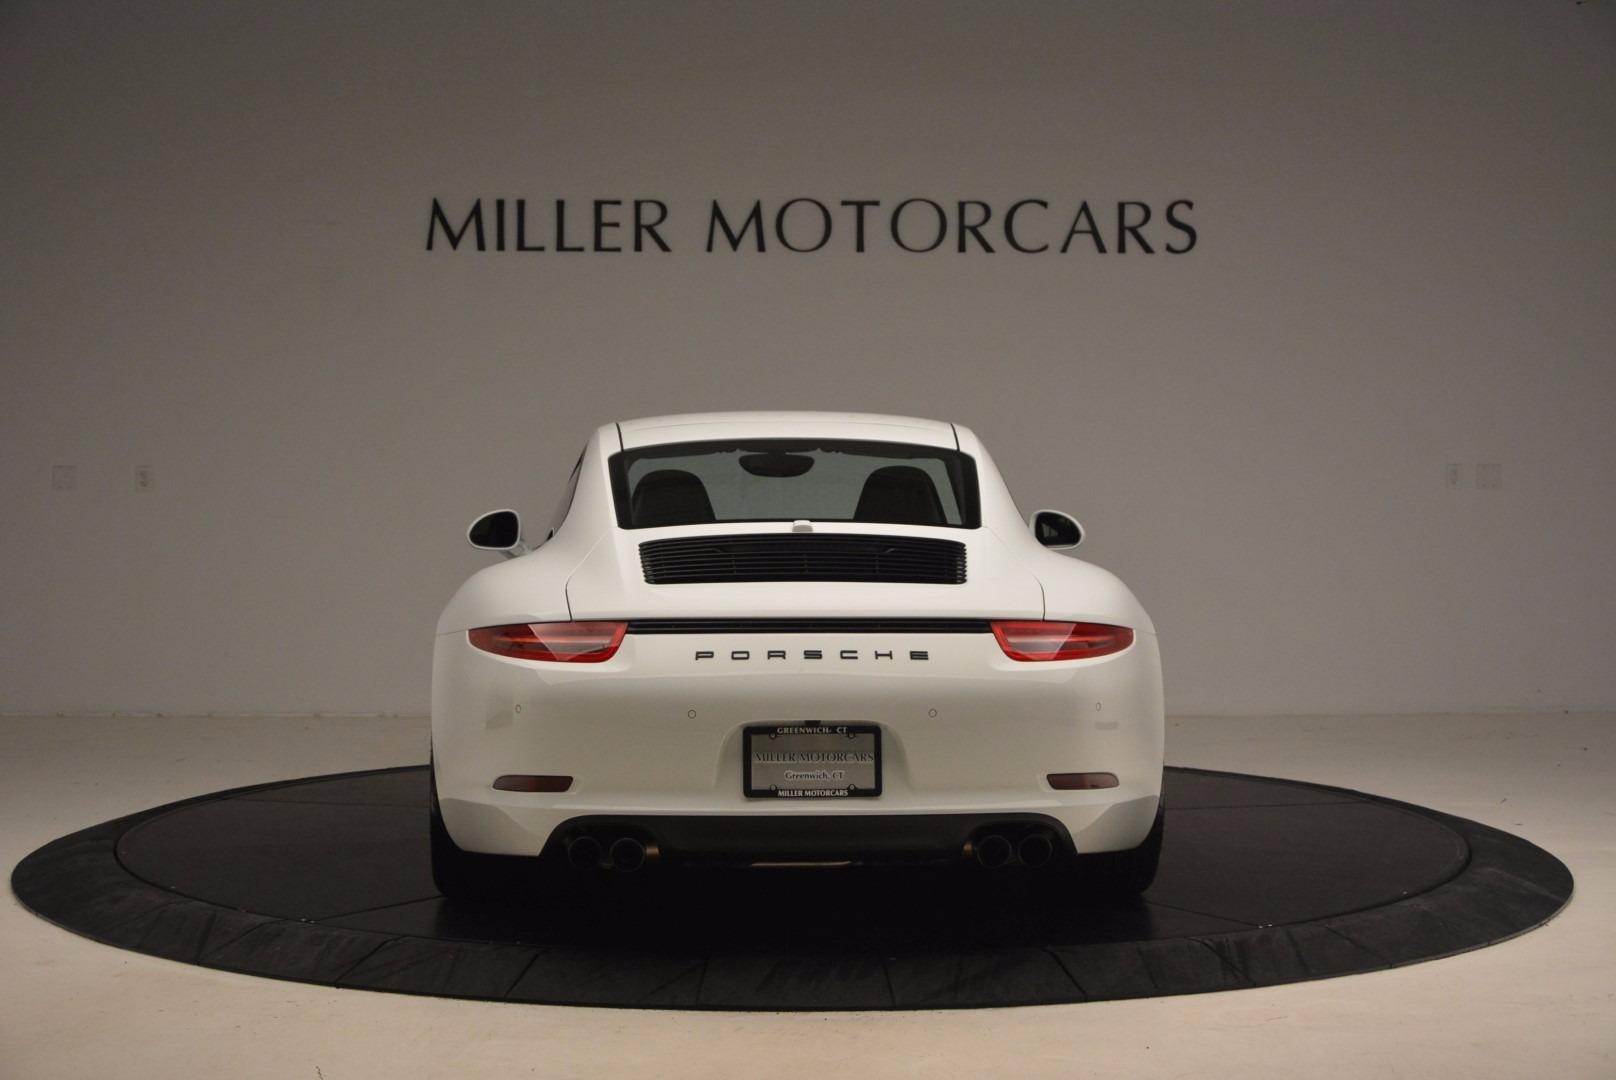 Used 2015 Porsche 911 Carrera GTS For Sale In Greenwich, CT 1444_p6